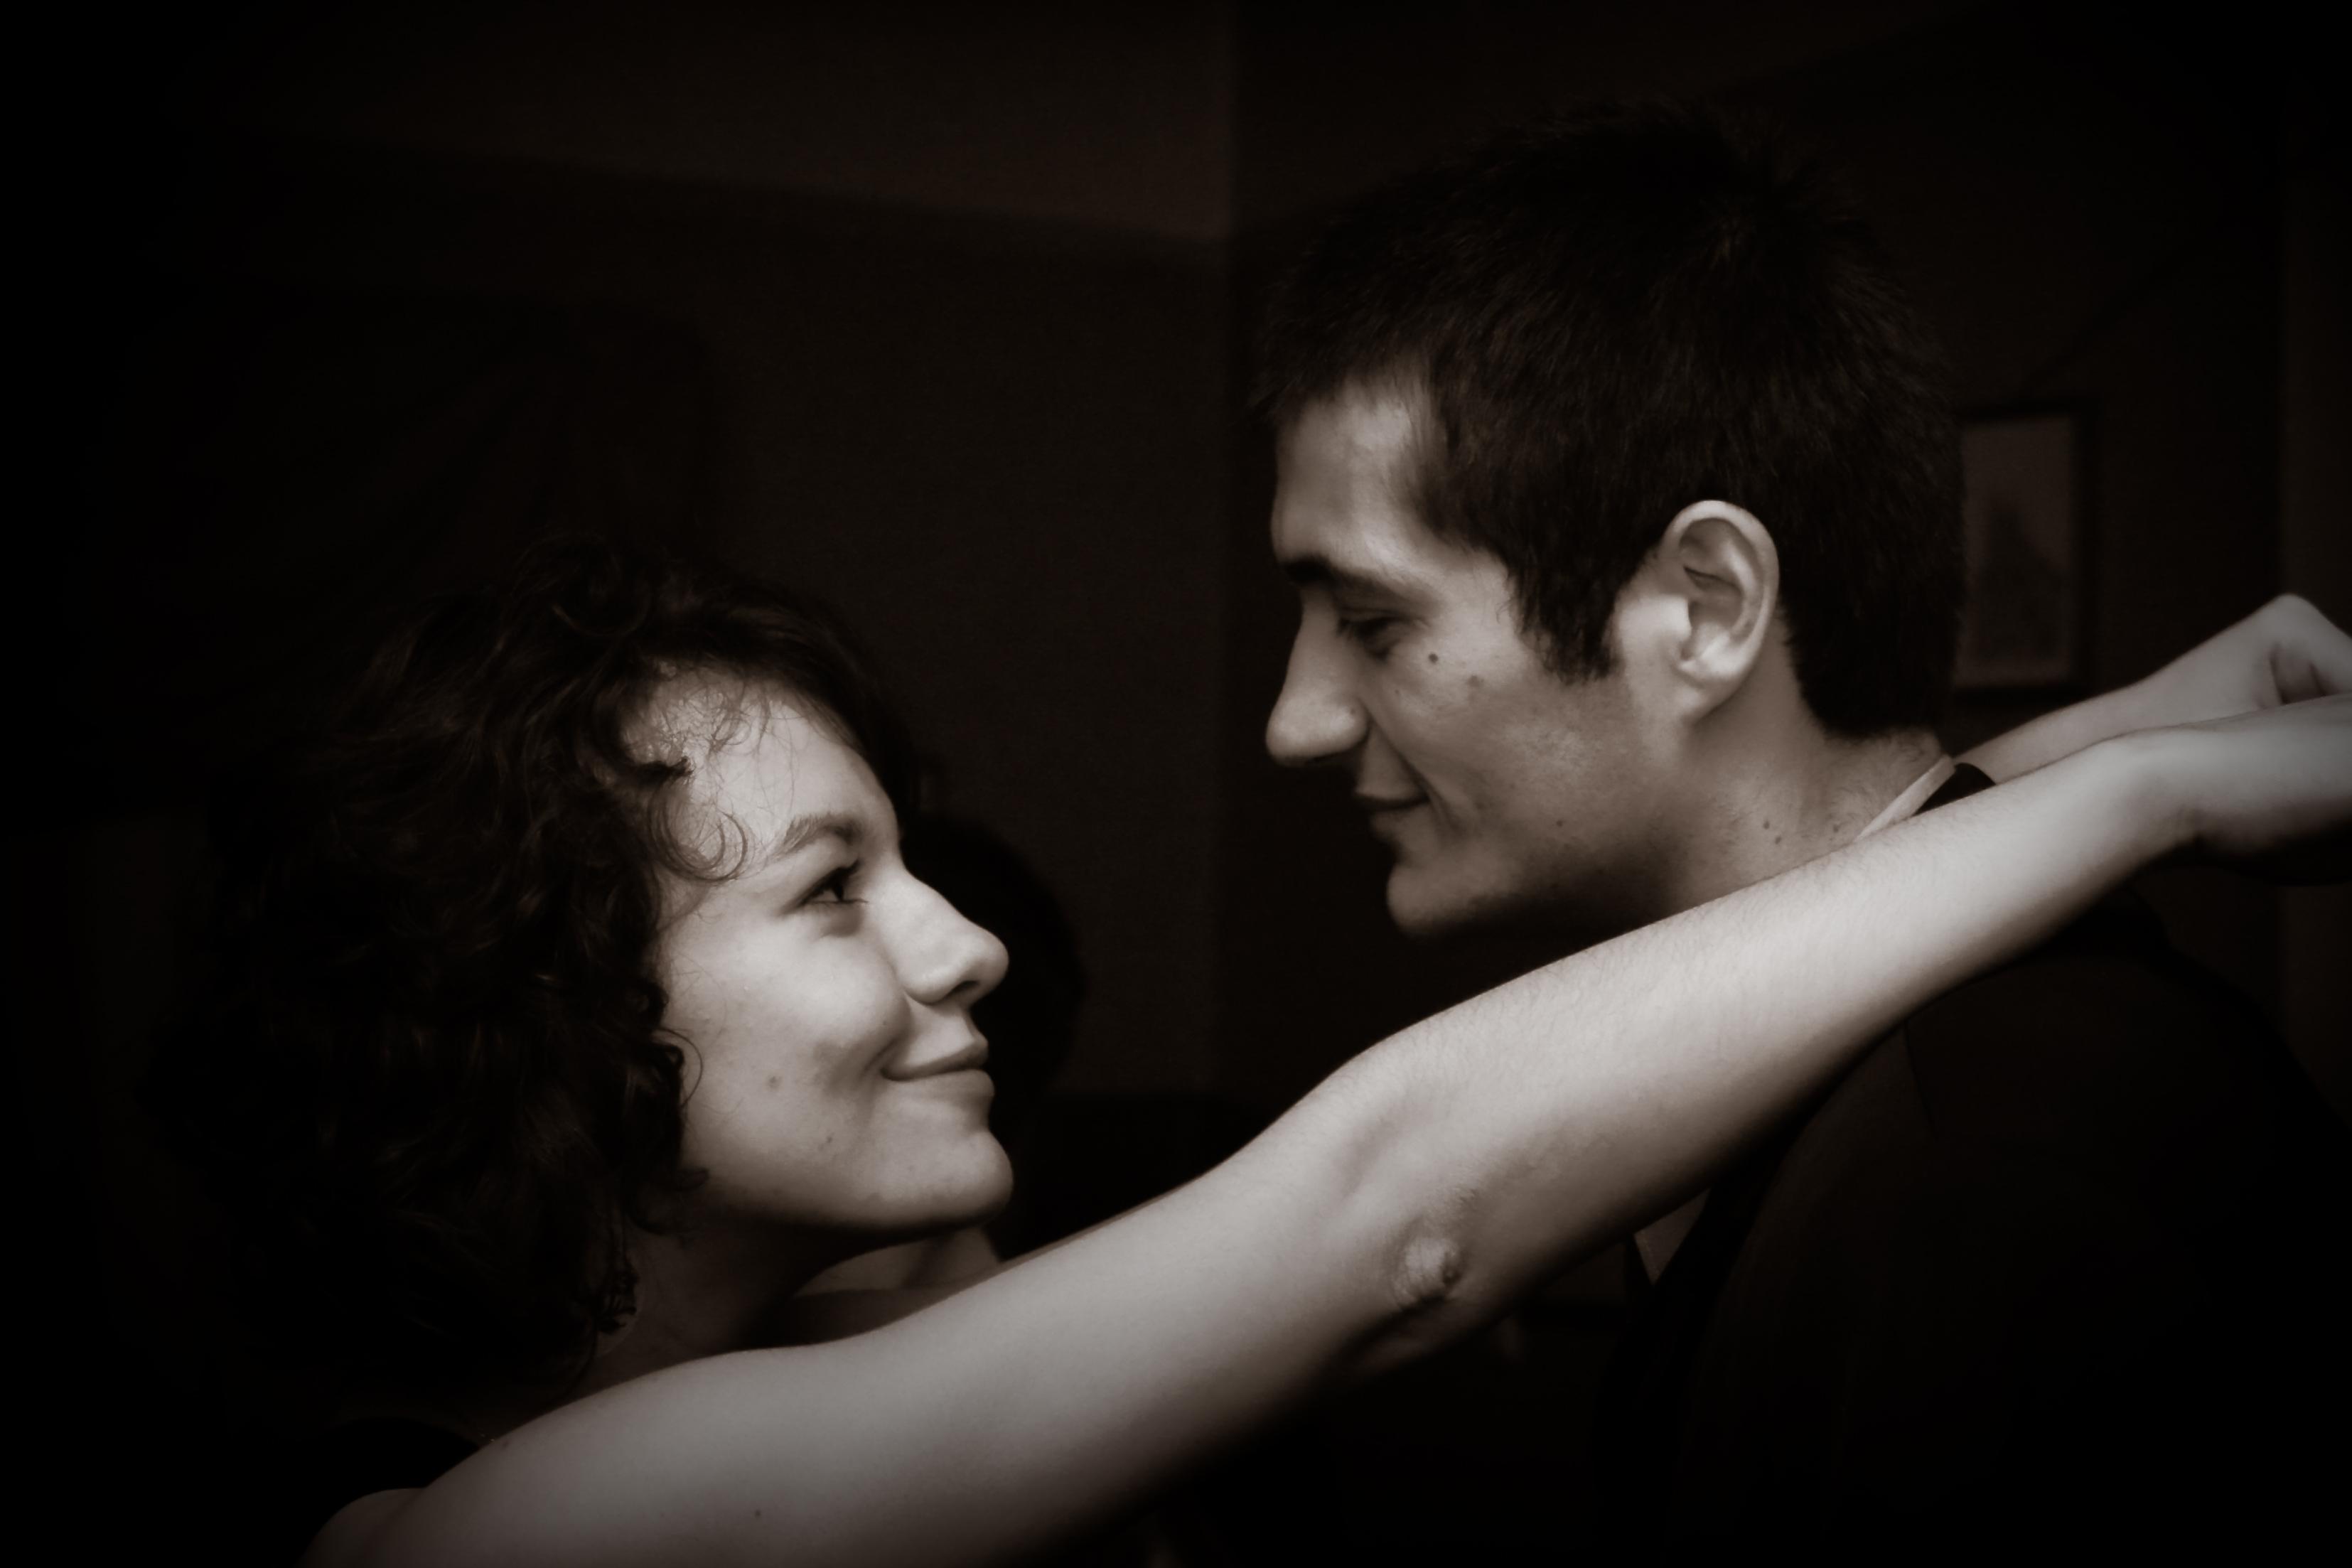 lovers-faces-1428976_1.jpg